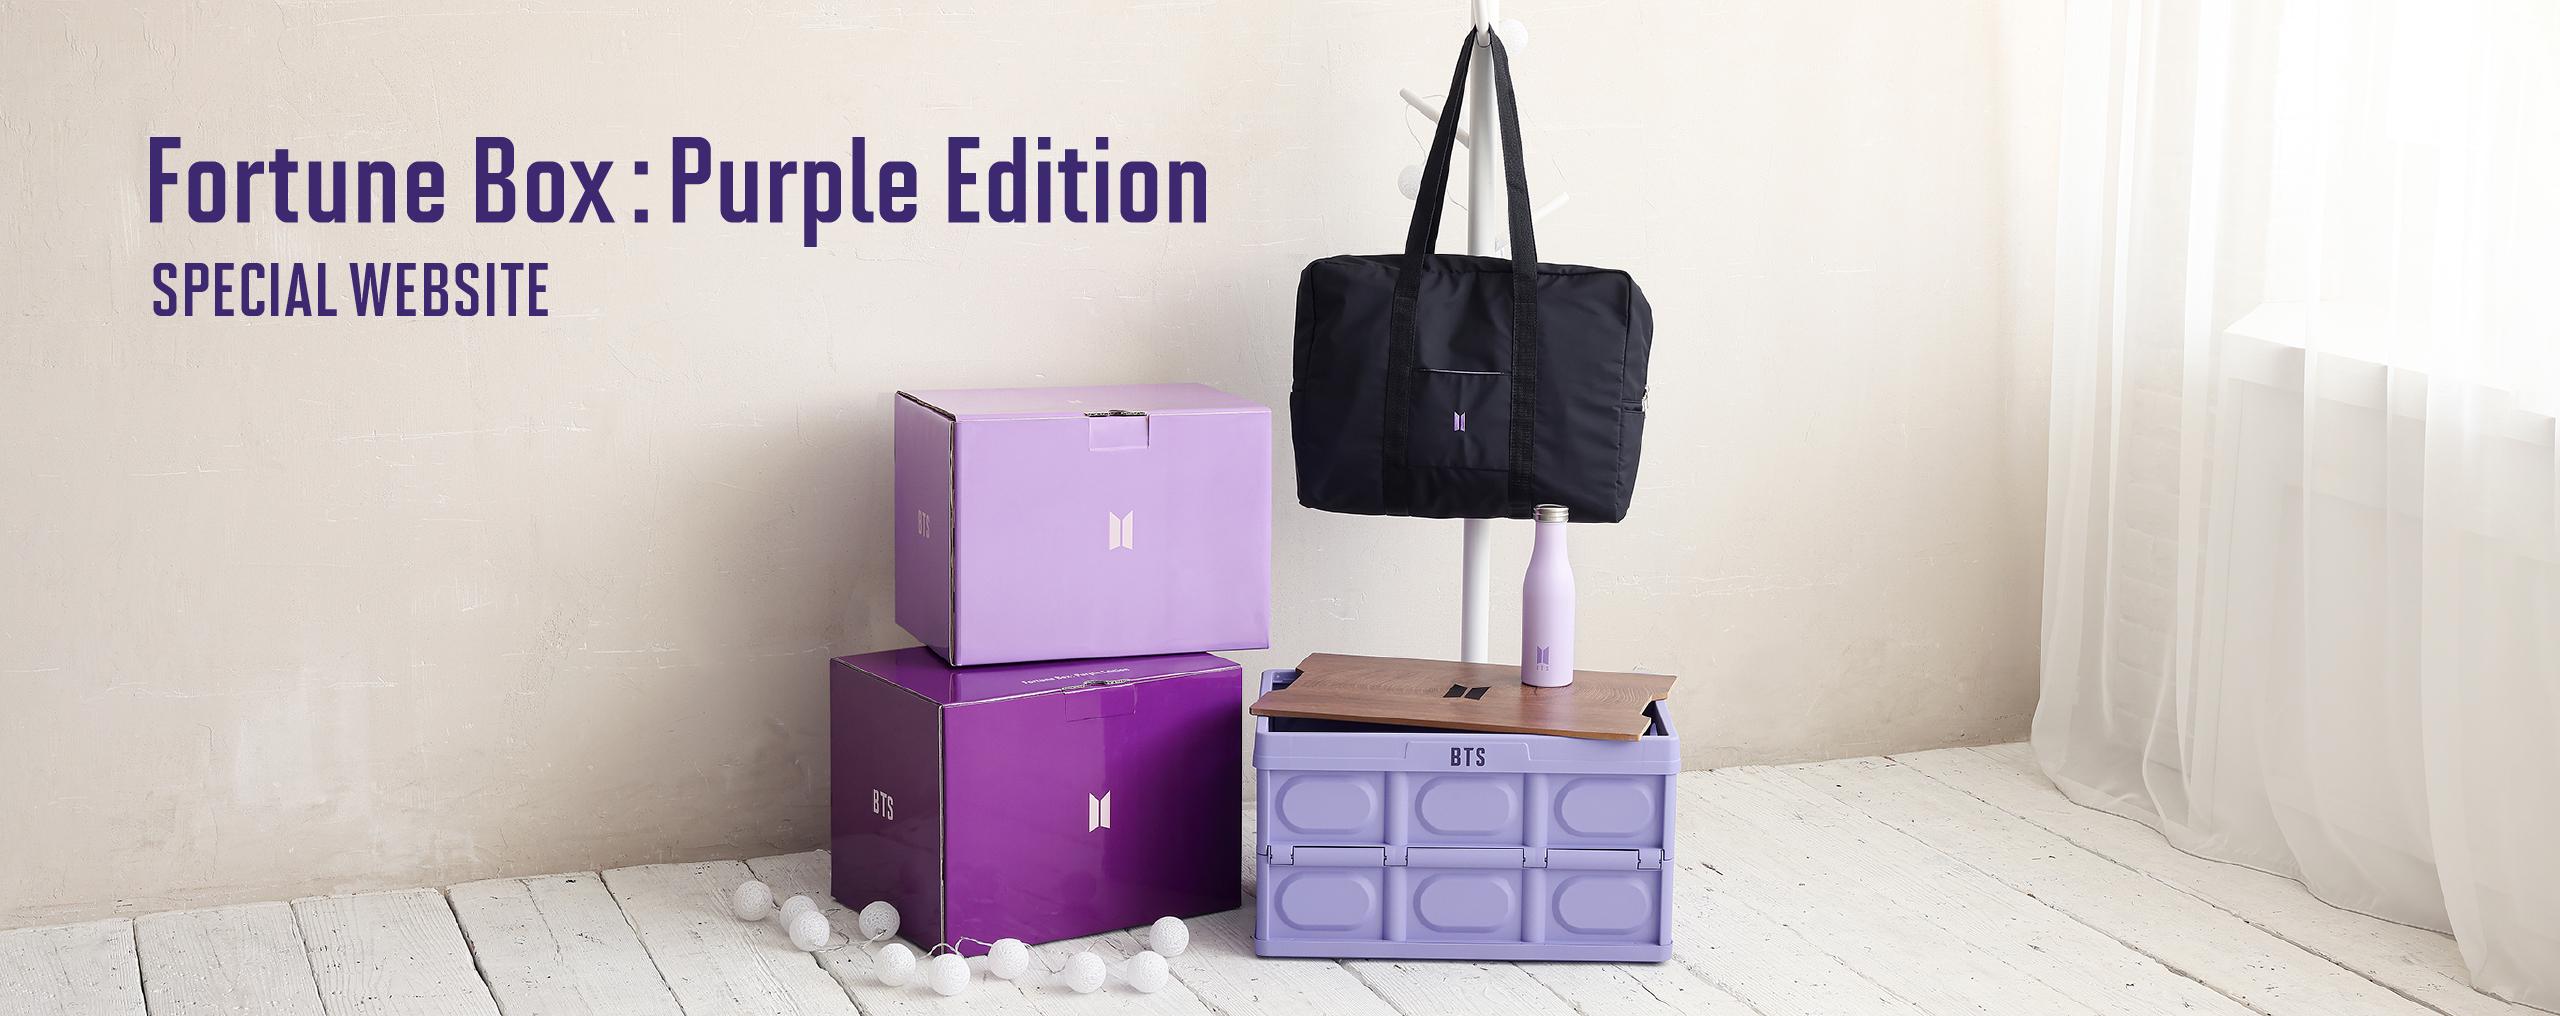 BTS_FortuneBox_PurpleEdition_FC_PC